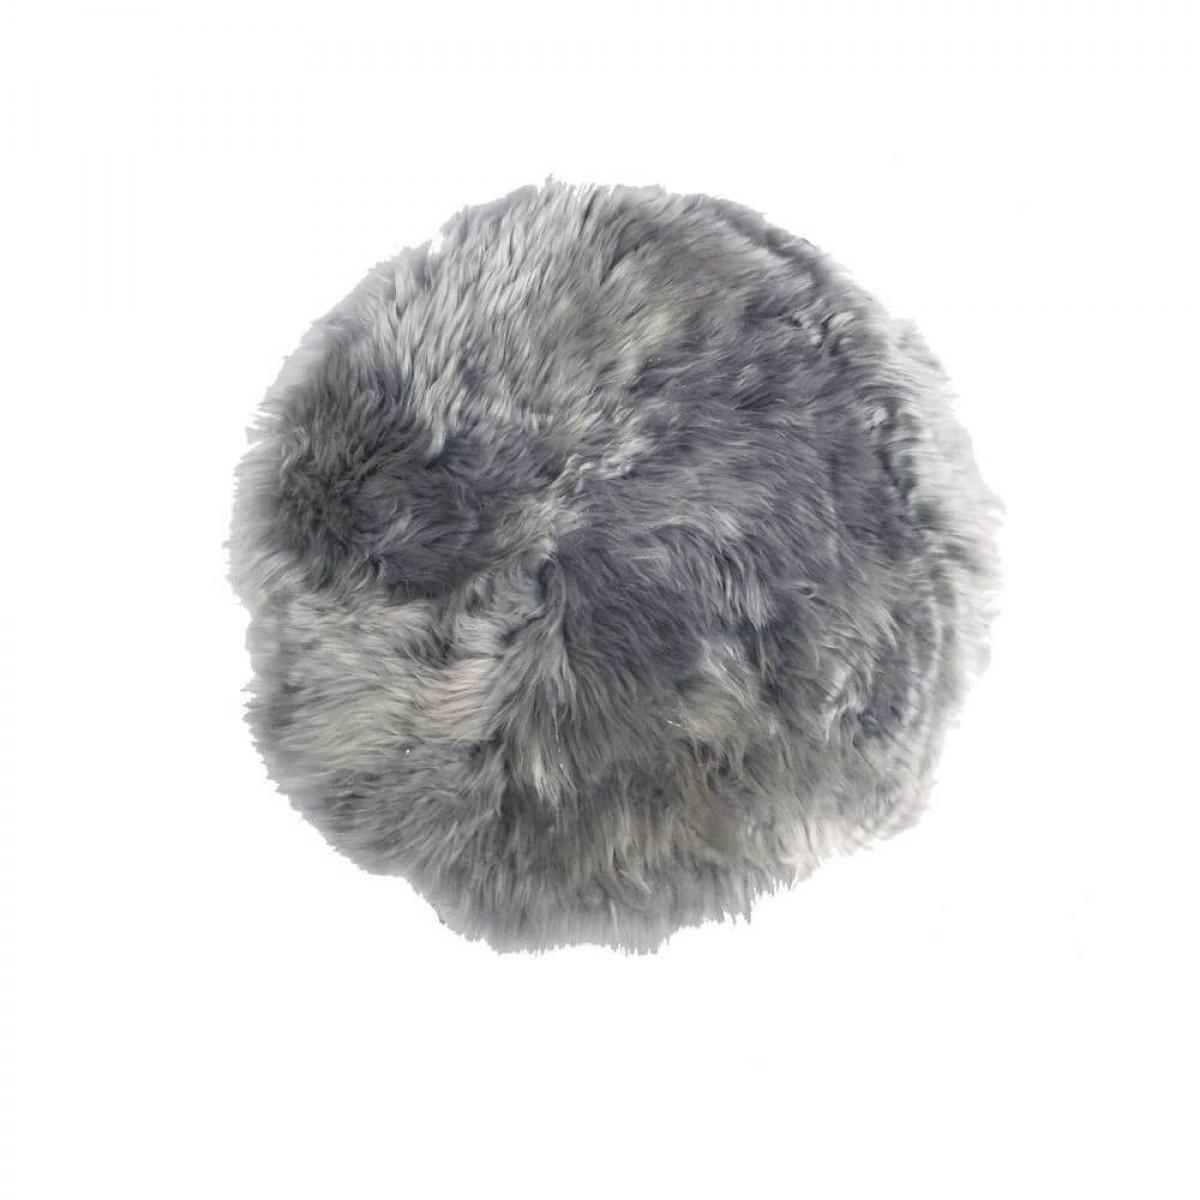 DACORE Sædehynde lammeskind lys grå rund ø 37 cm